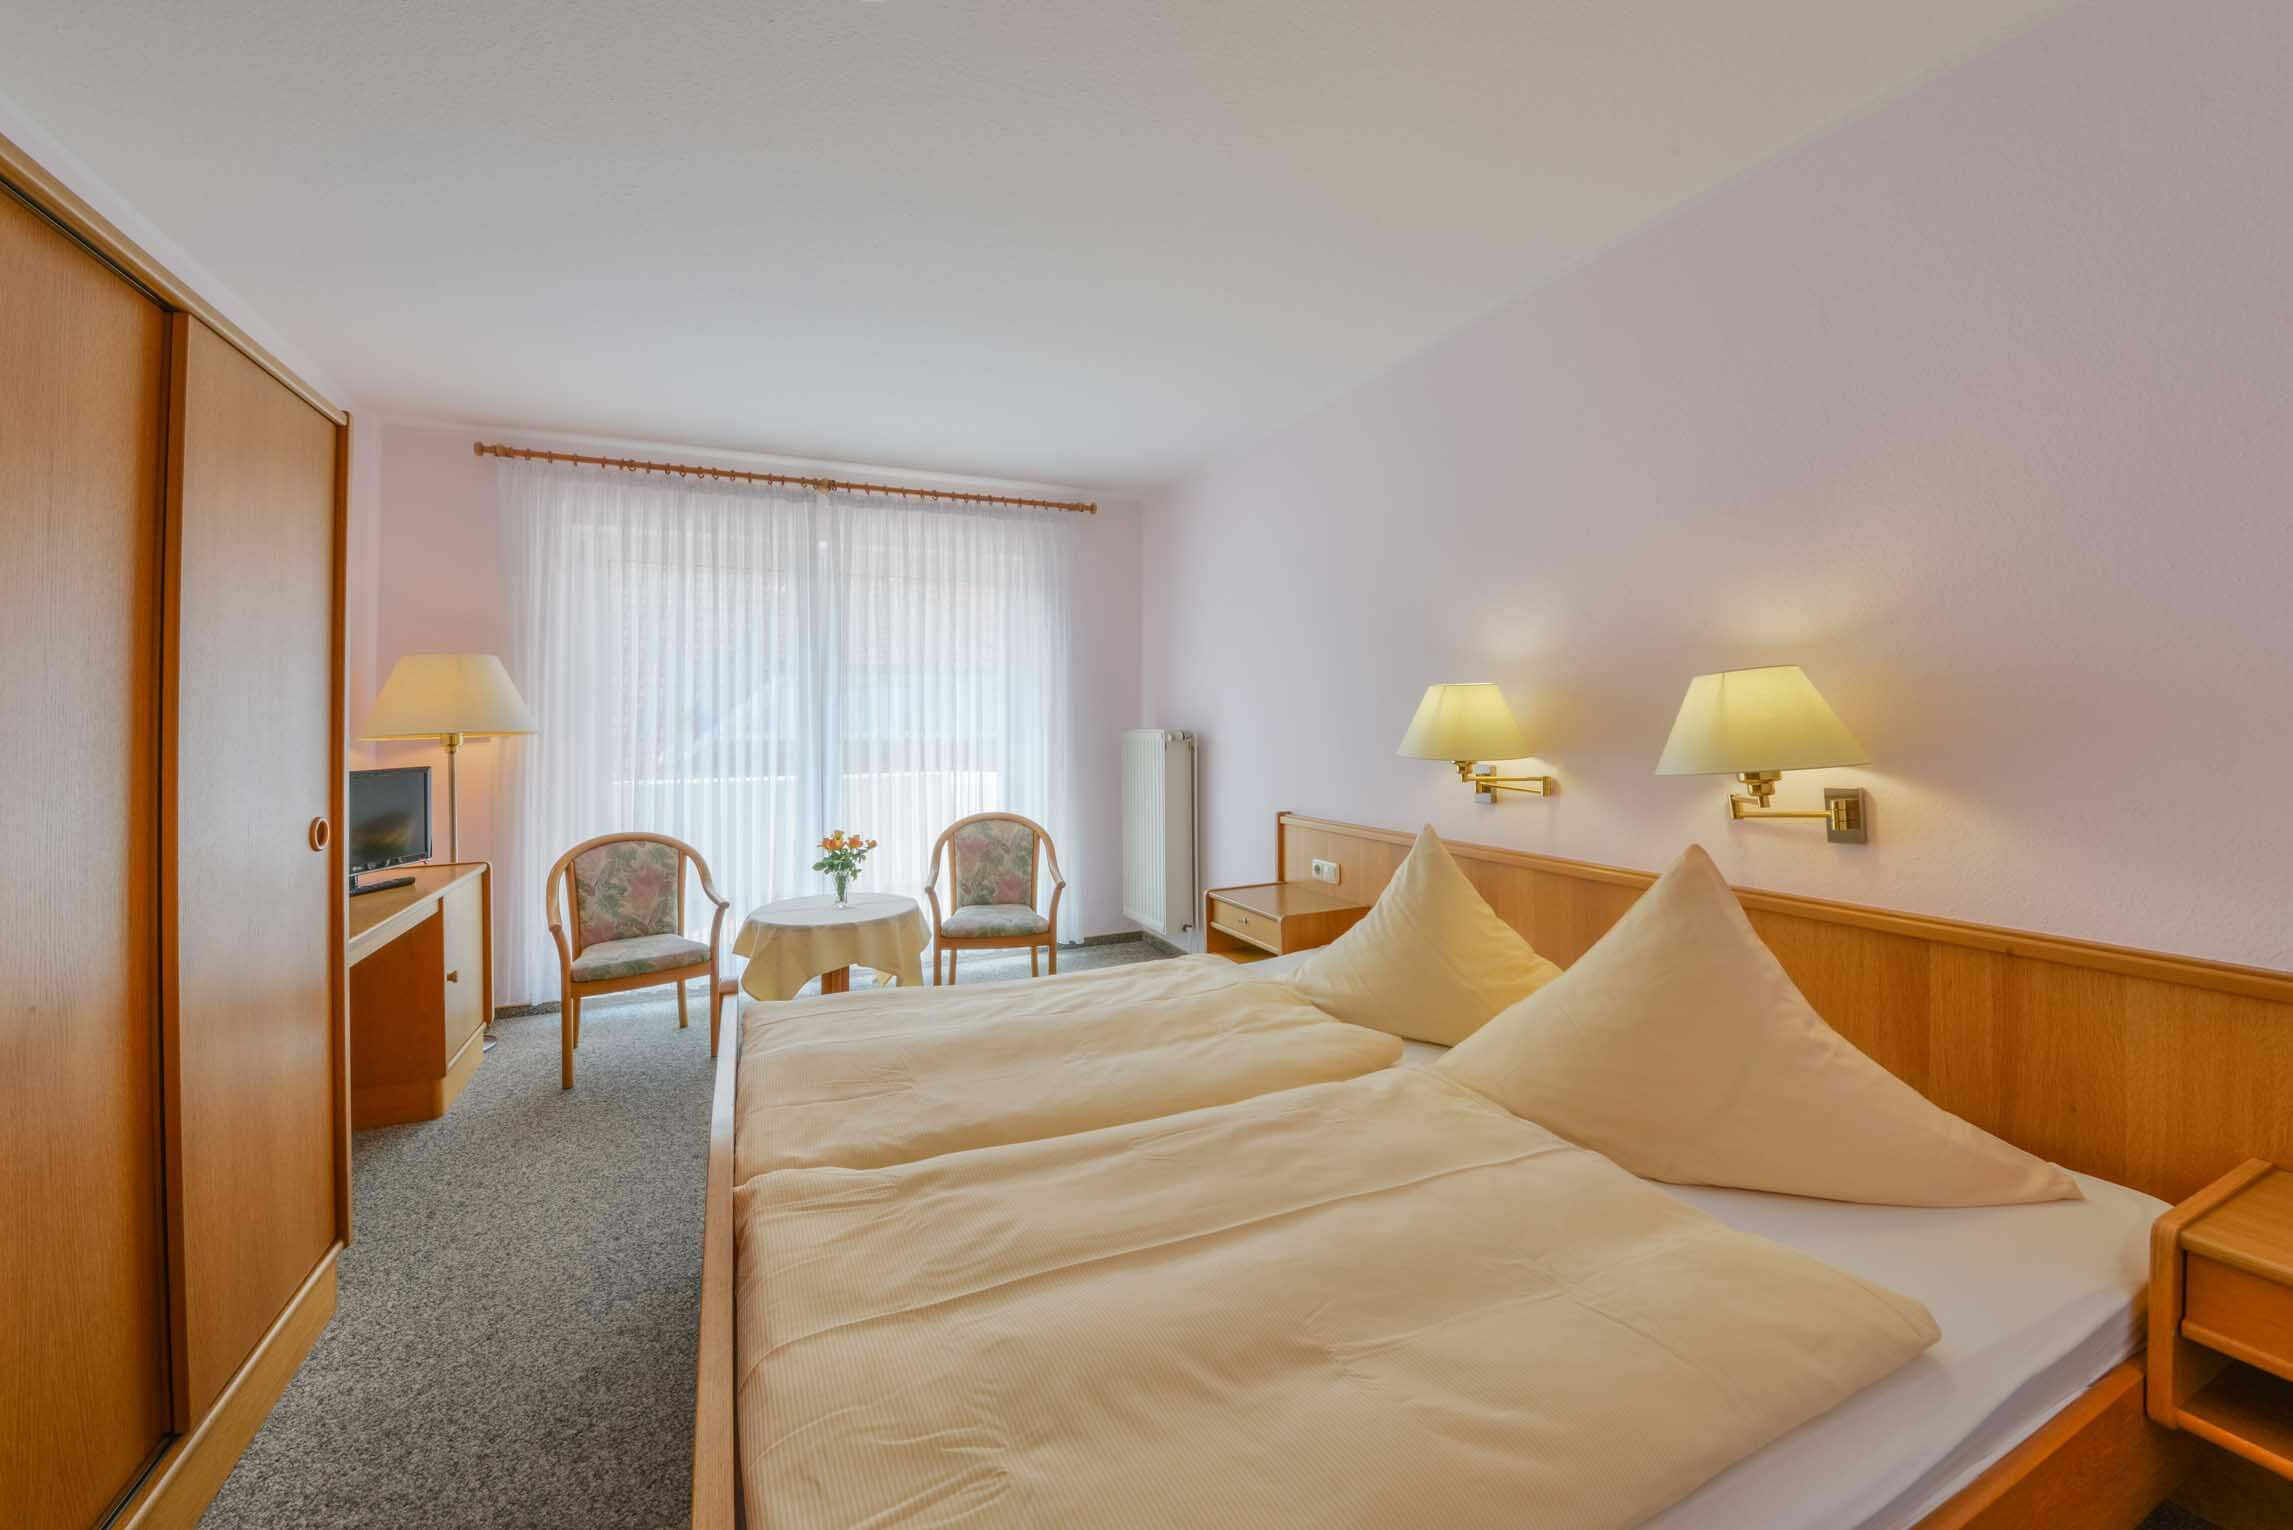 Hotel Braband Cuxhaven Doppelzimmer